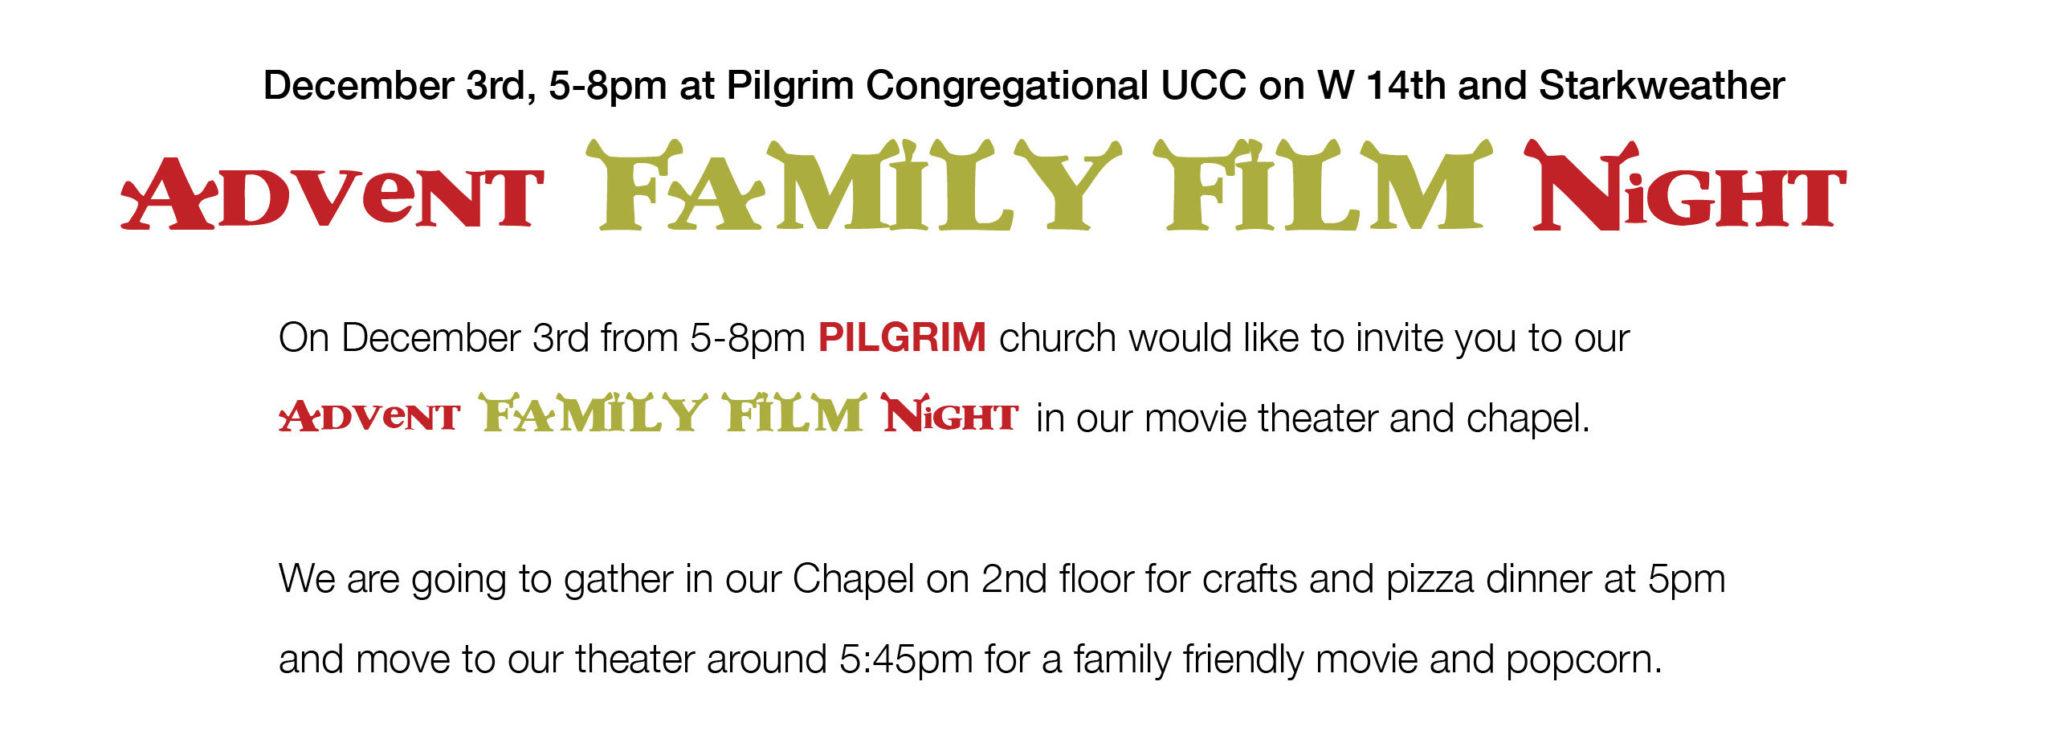 Advent Family Film Night